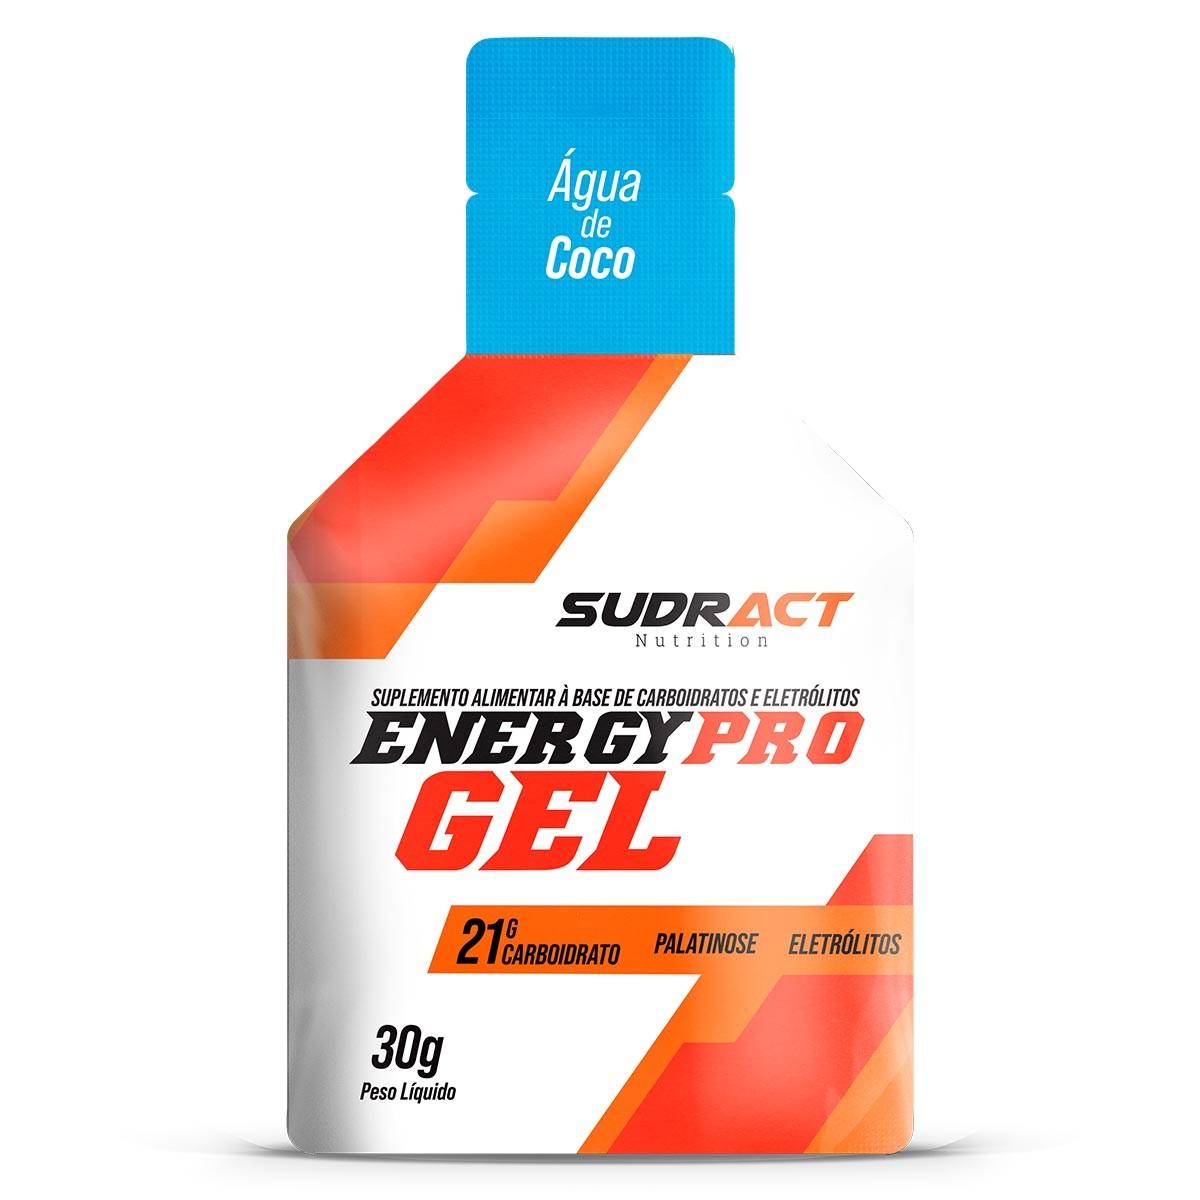 Energy Pro Gel 15 Unidades - Sudract